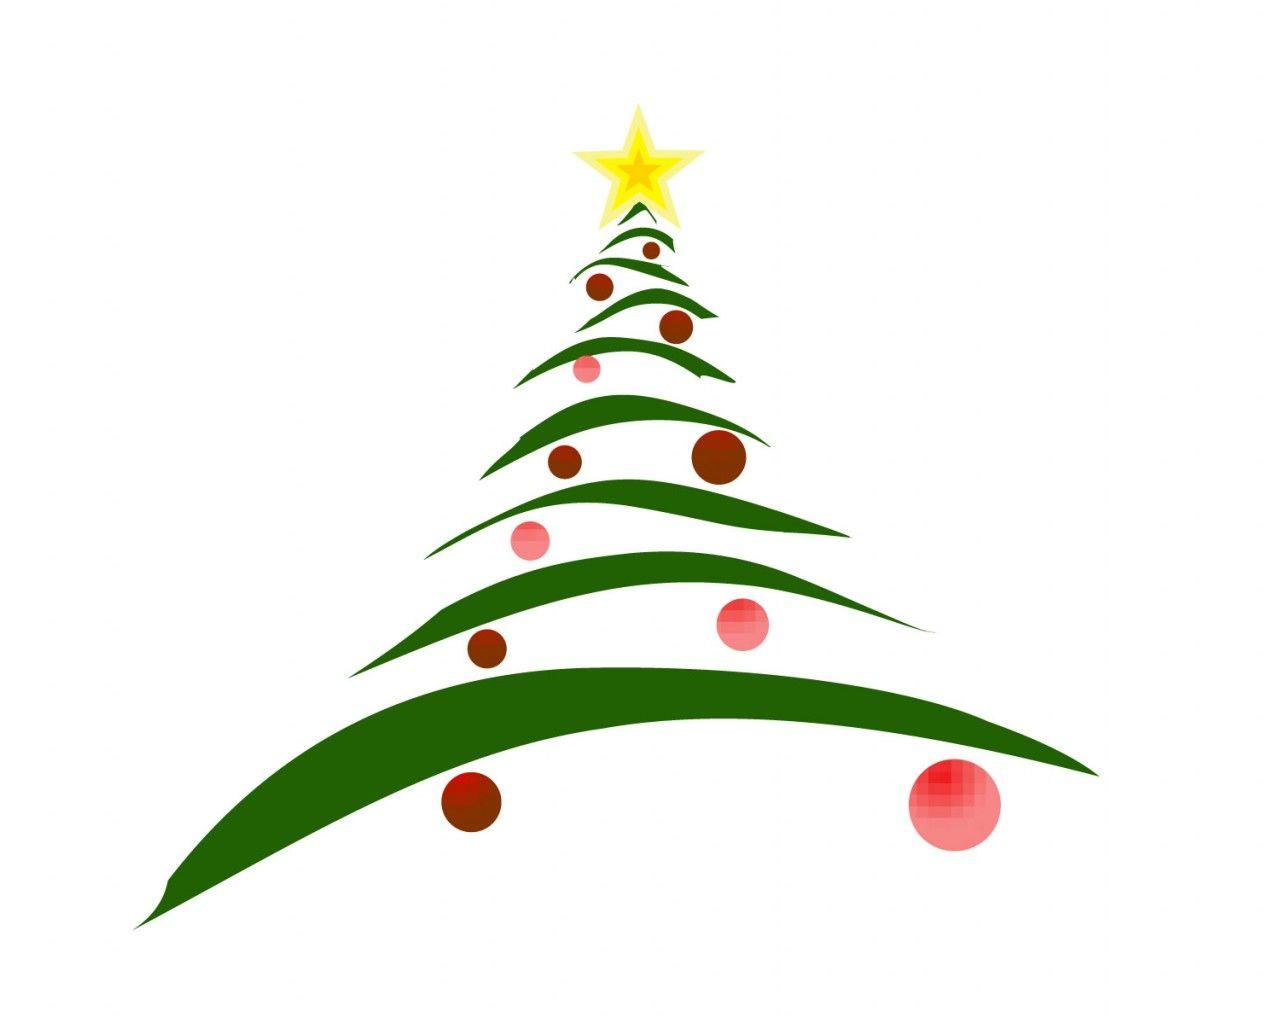 Uncategorized Christmas Tree Drawings Images christmas tree drawing stock vector cienpies 2127690 on clipart lkfnn4g4